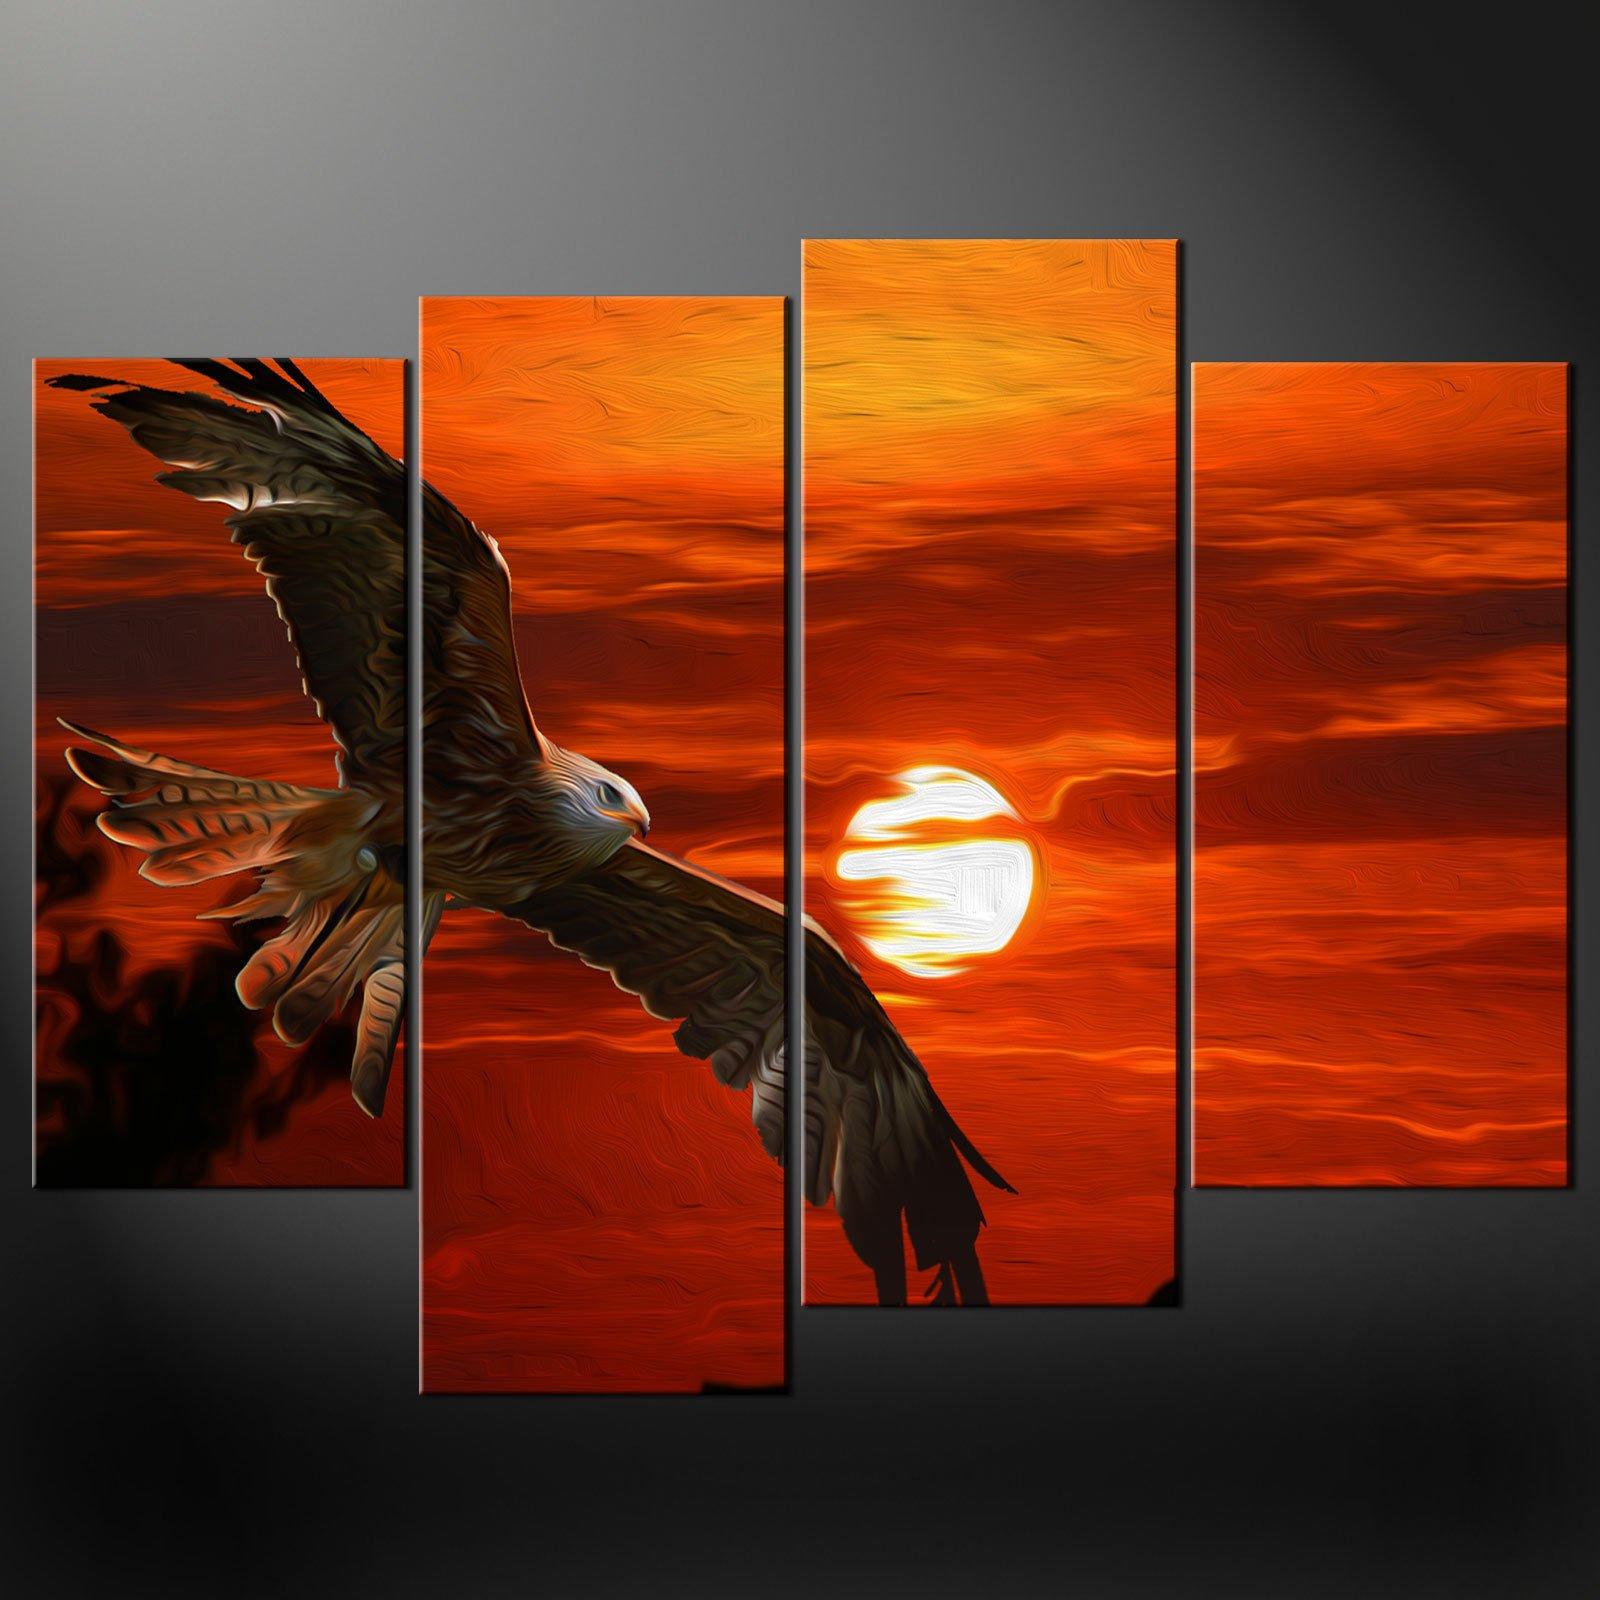 Sunset Eagle Orange Split Canvas Wall Art Pictures Prints